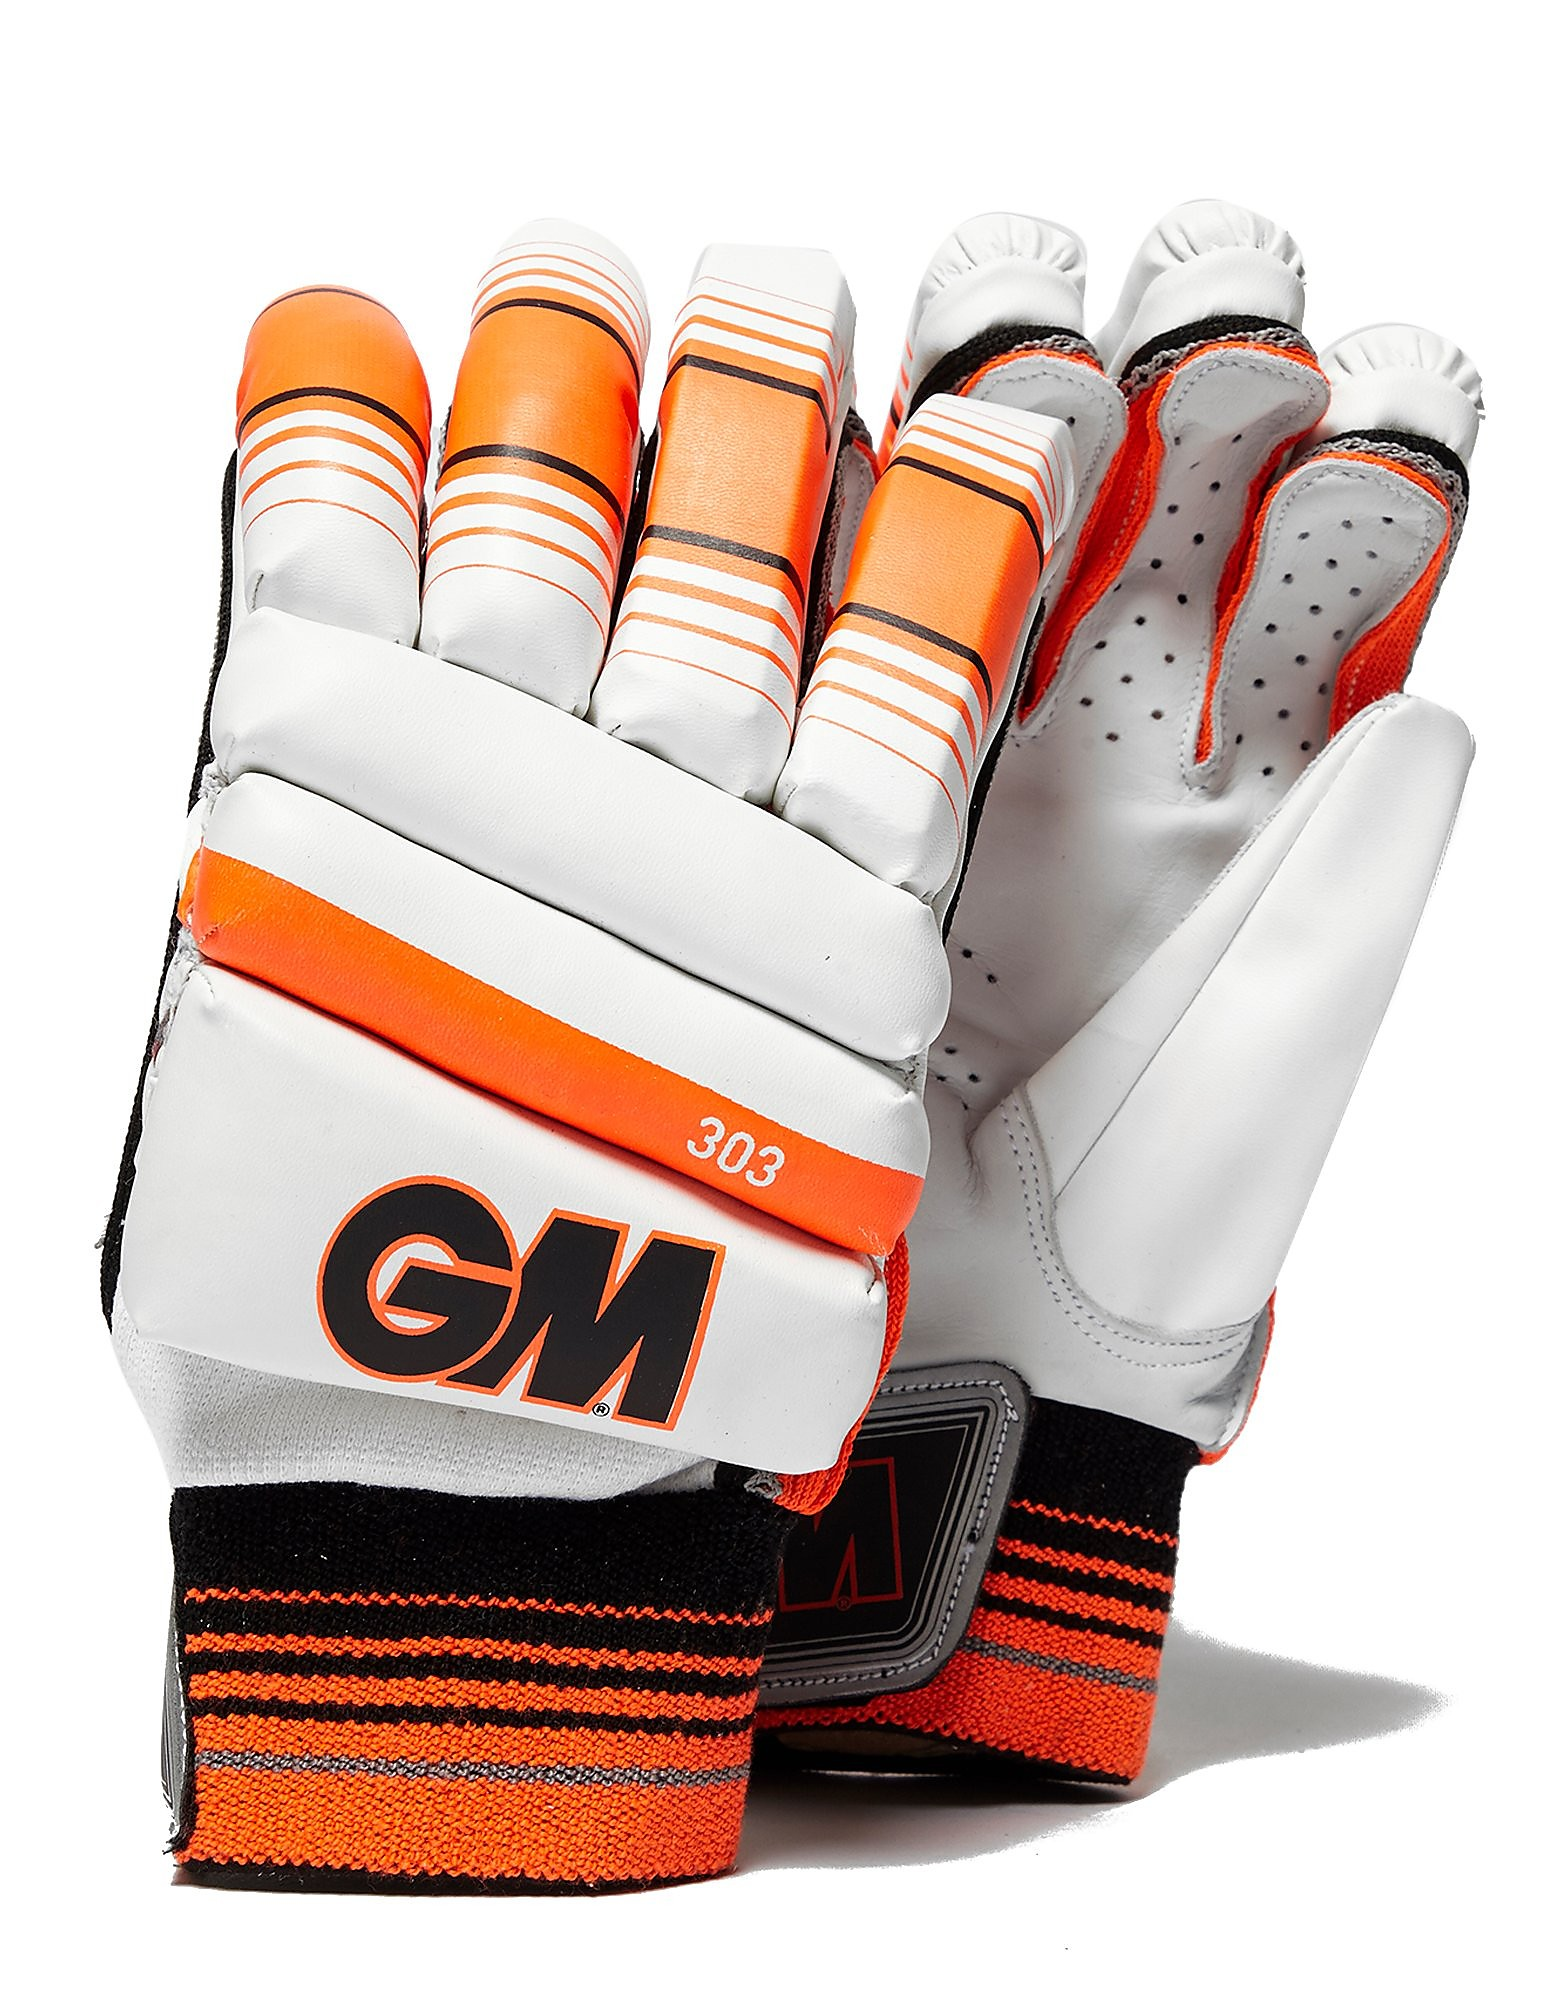 Gunn & Moore 303 Cricket Batting Gloves